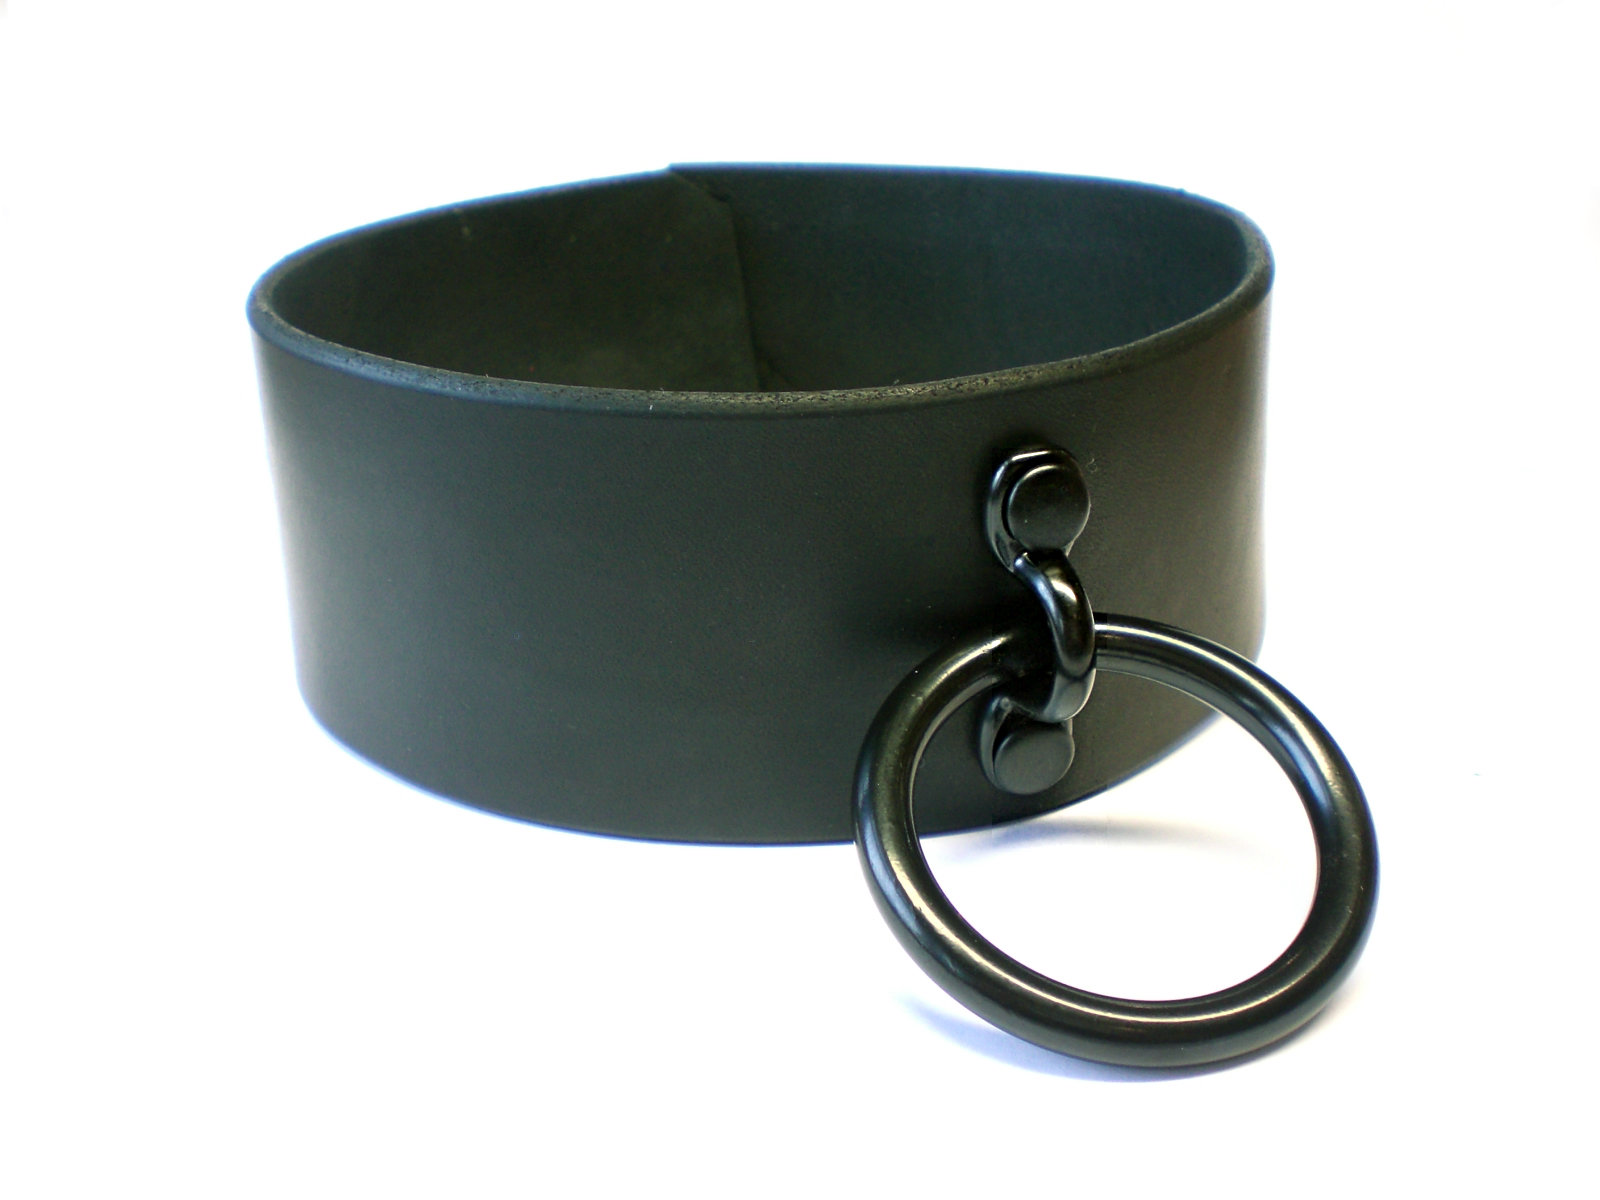 black latigo - side